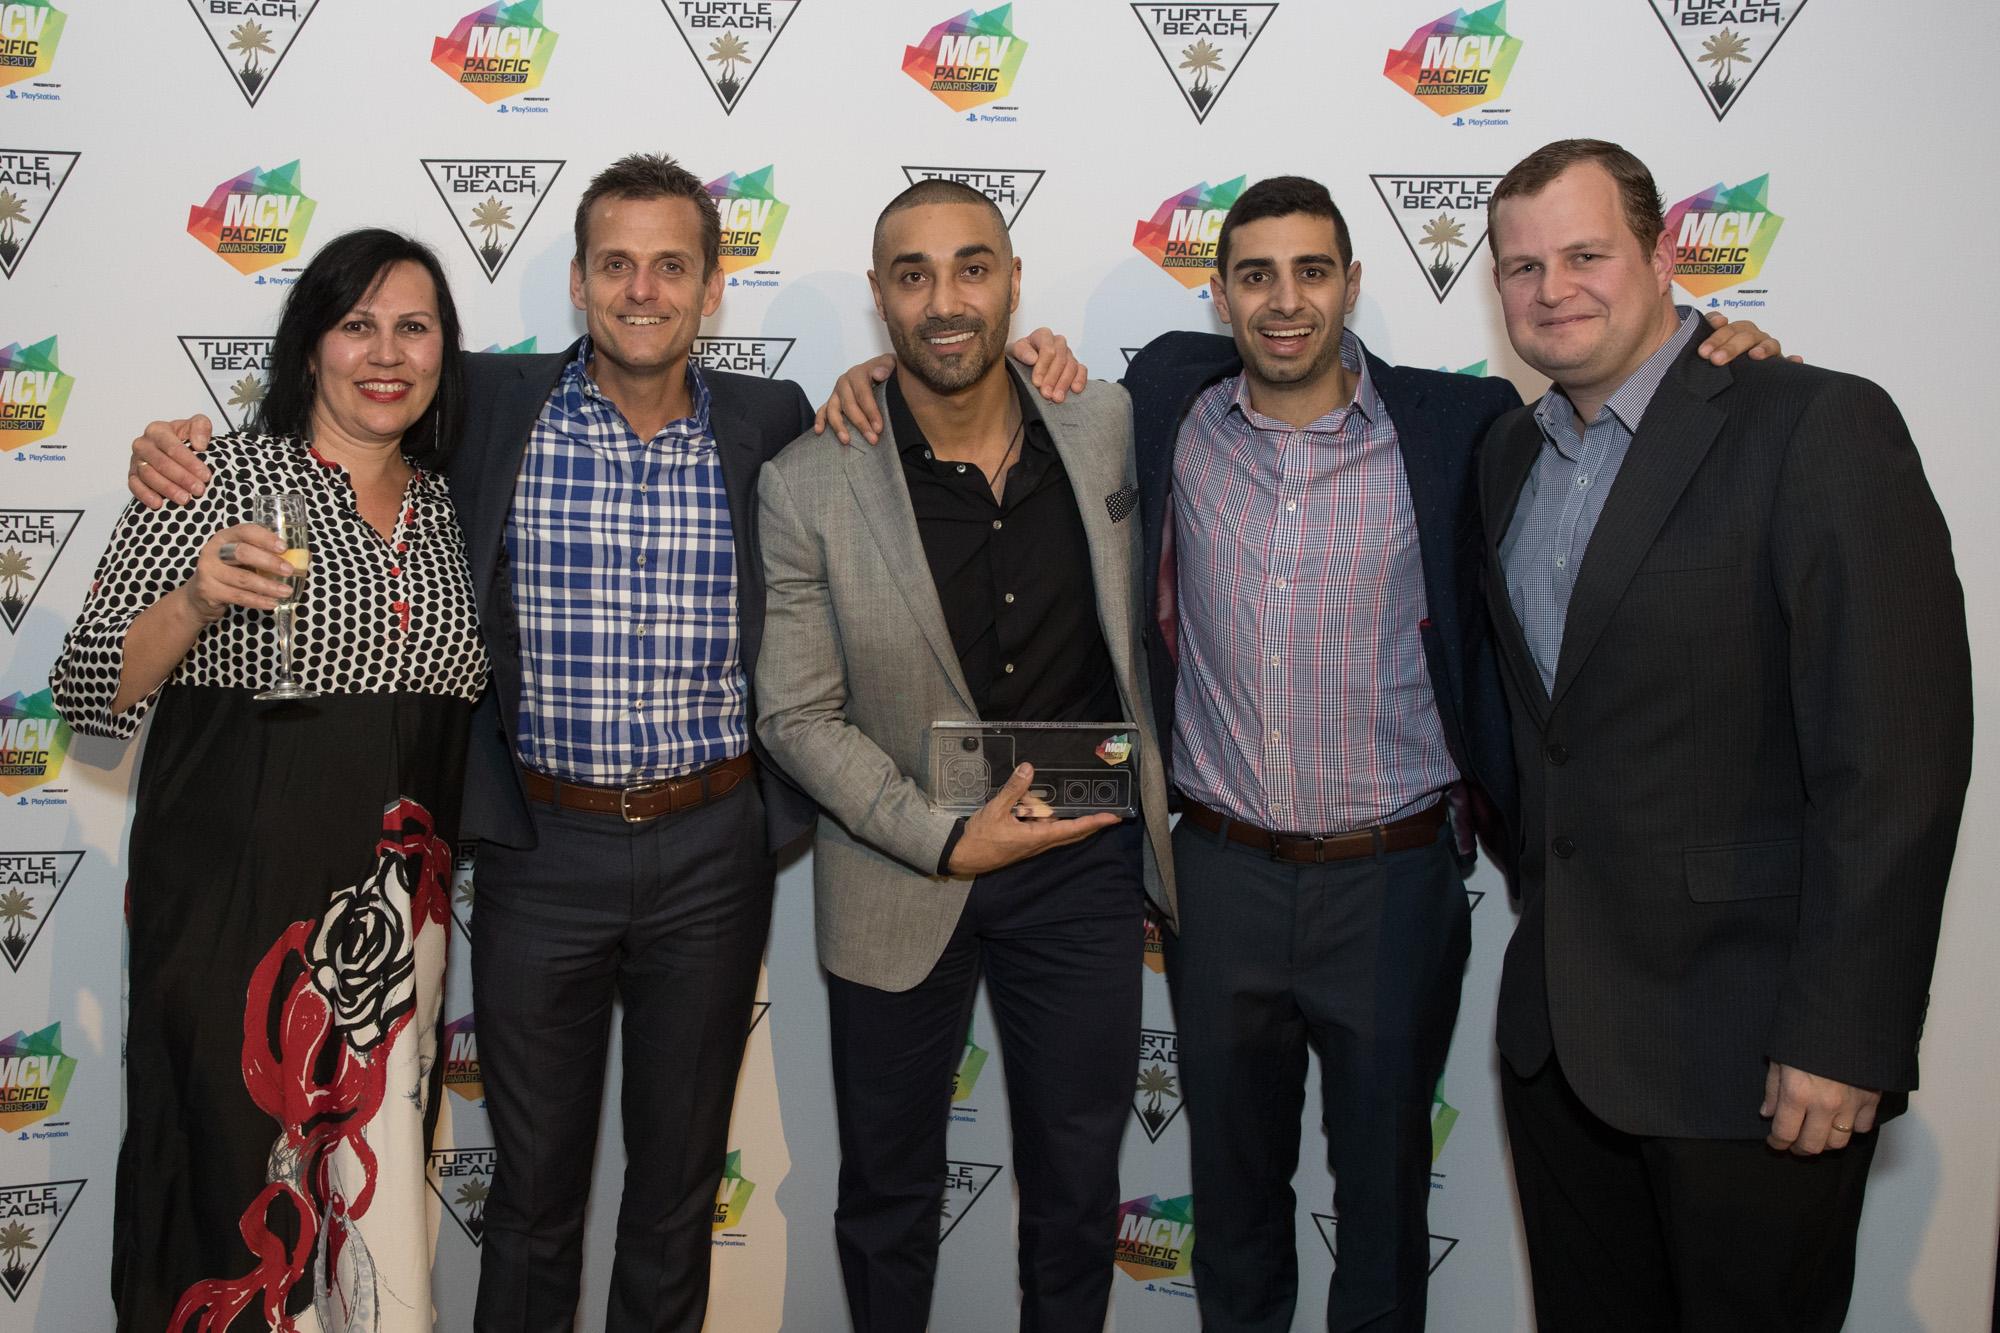 MCV_Pacific_Awards_1_June_17_PS_085.jpg